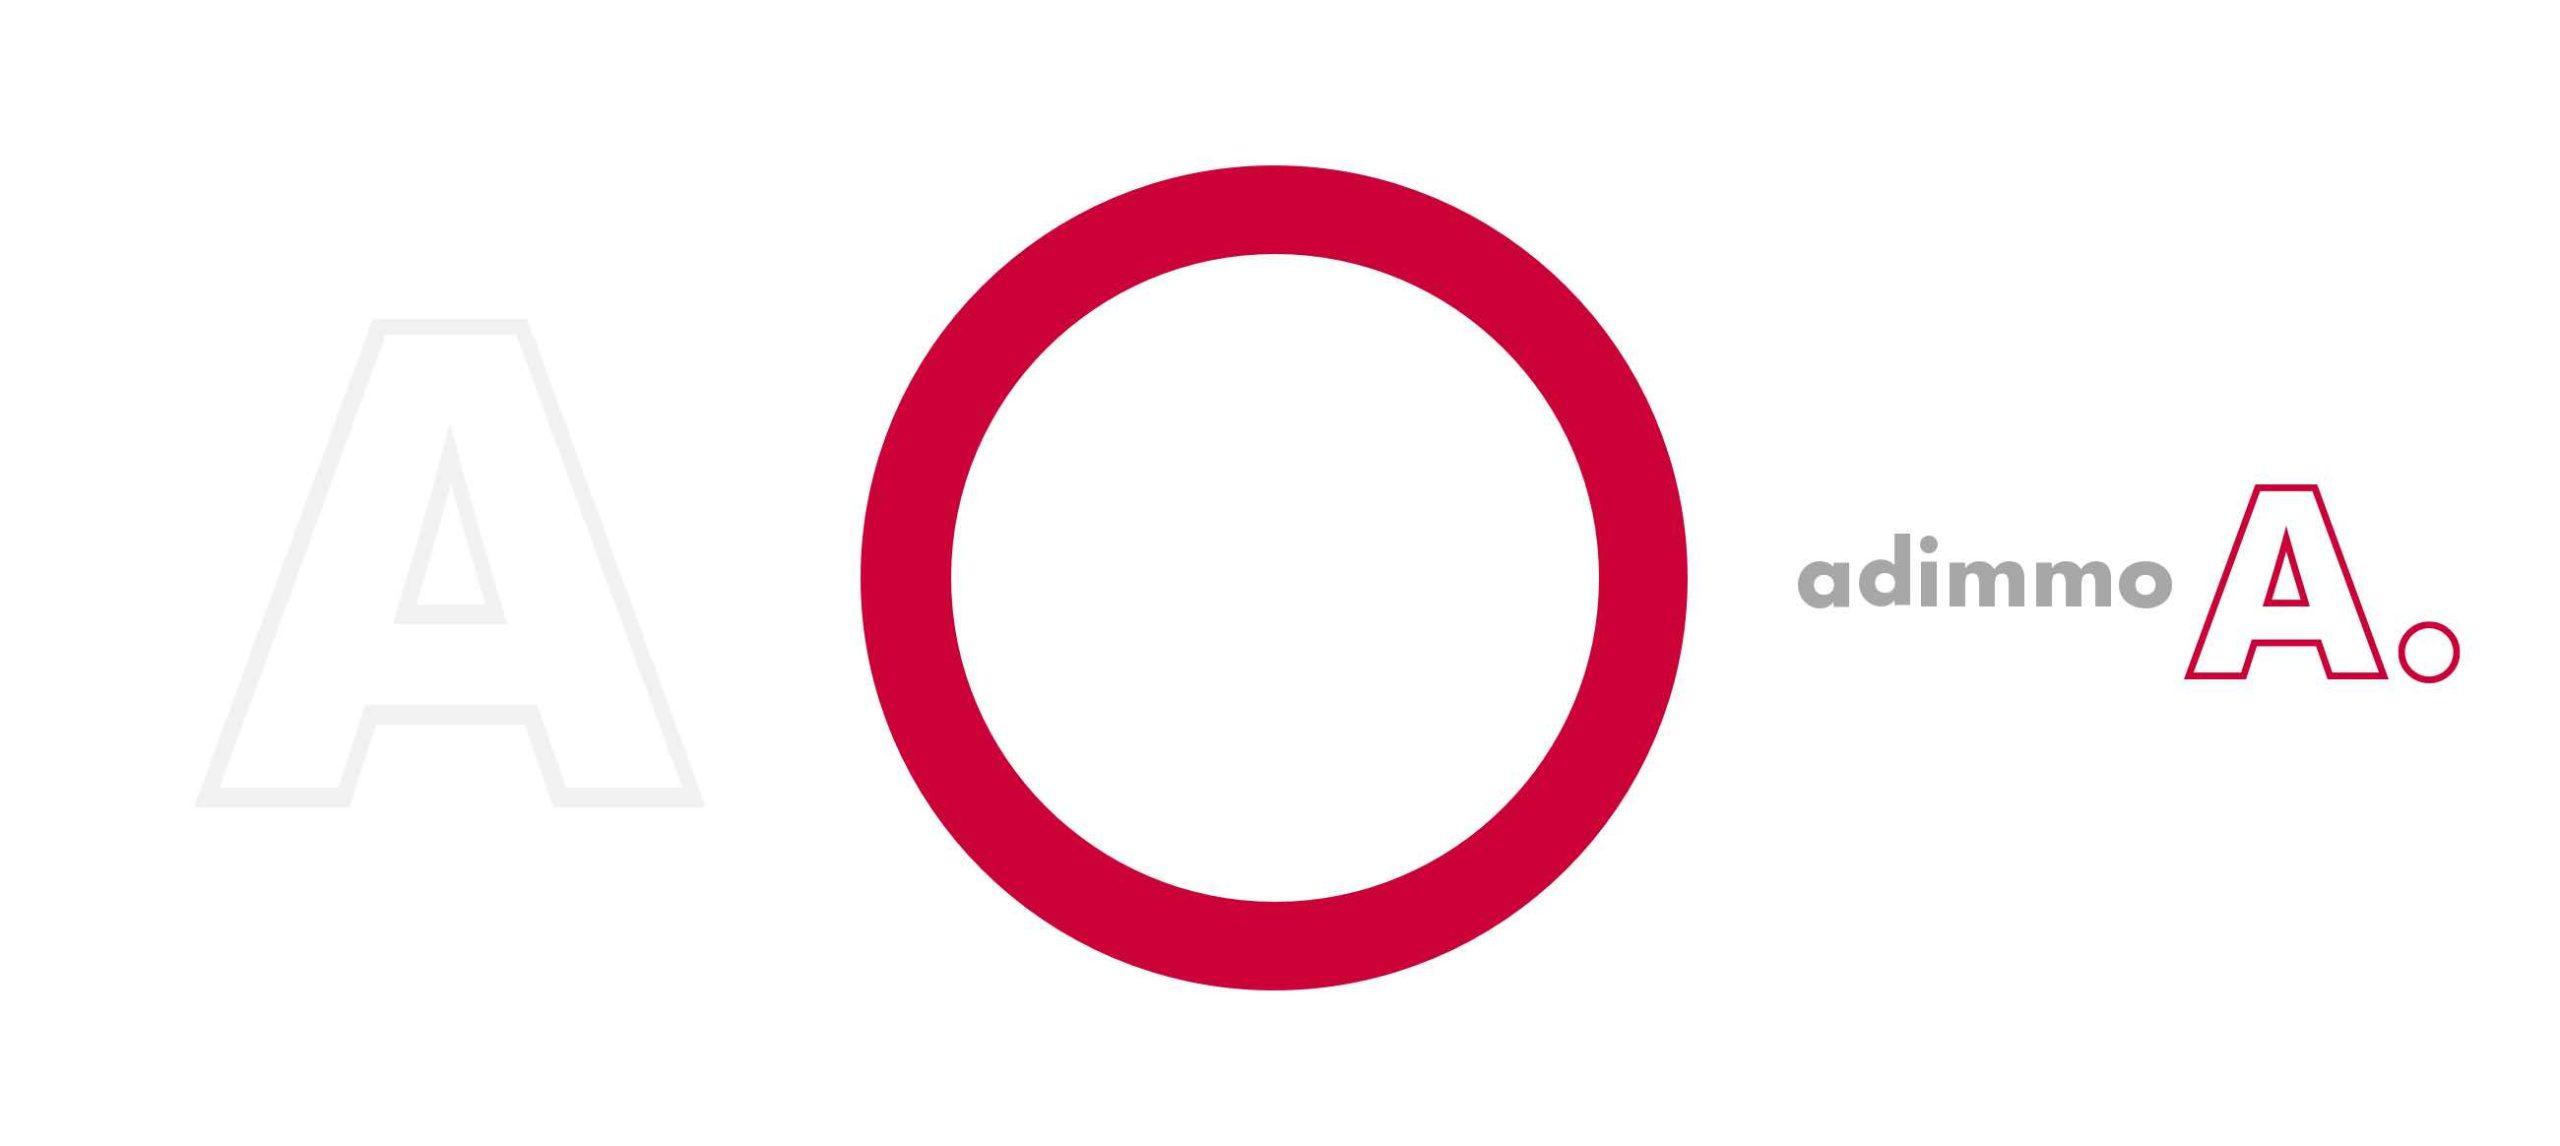 Adimmo Logo und Kreis-Symbol